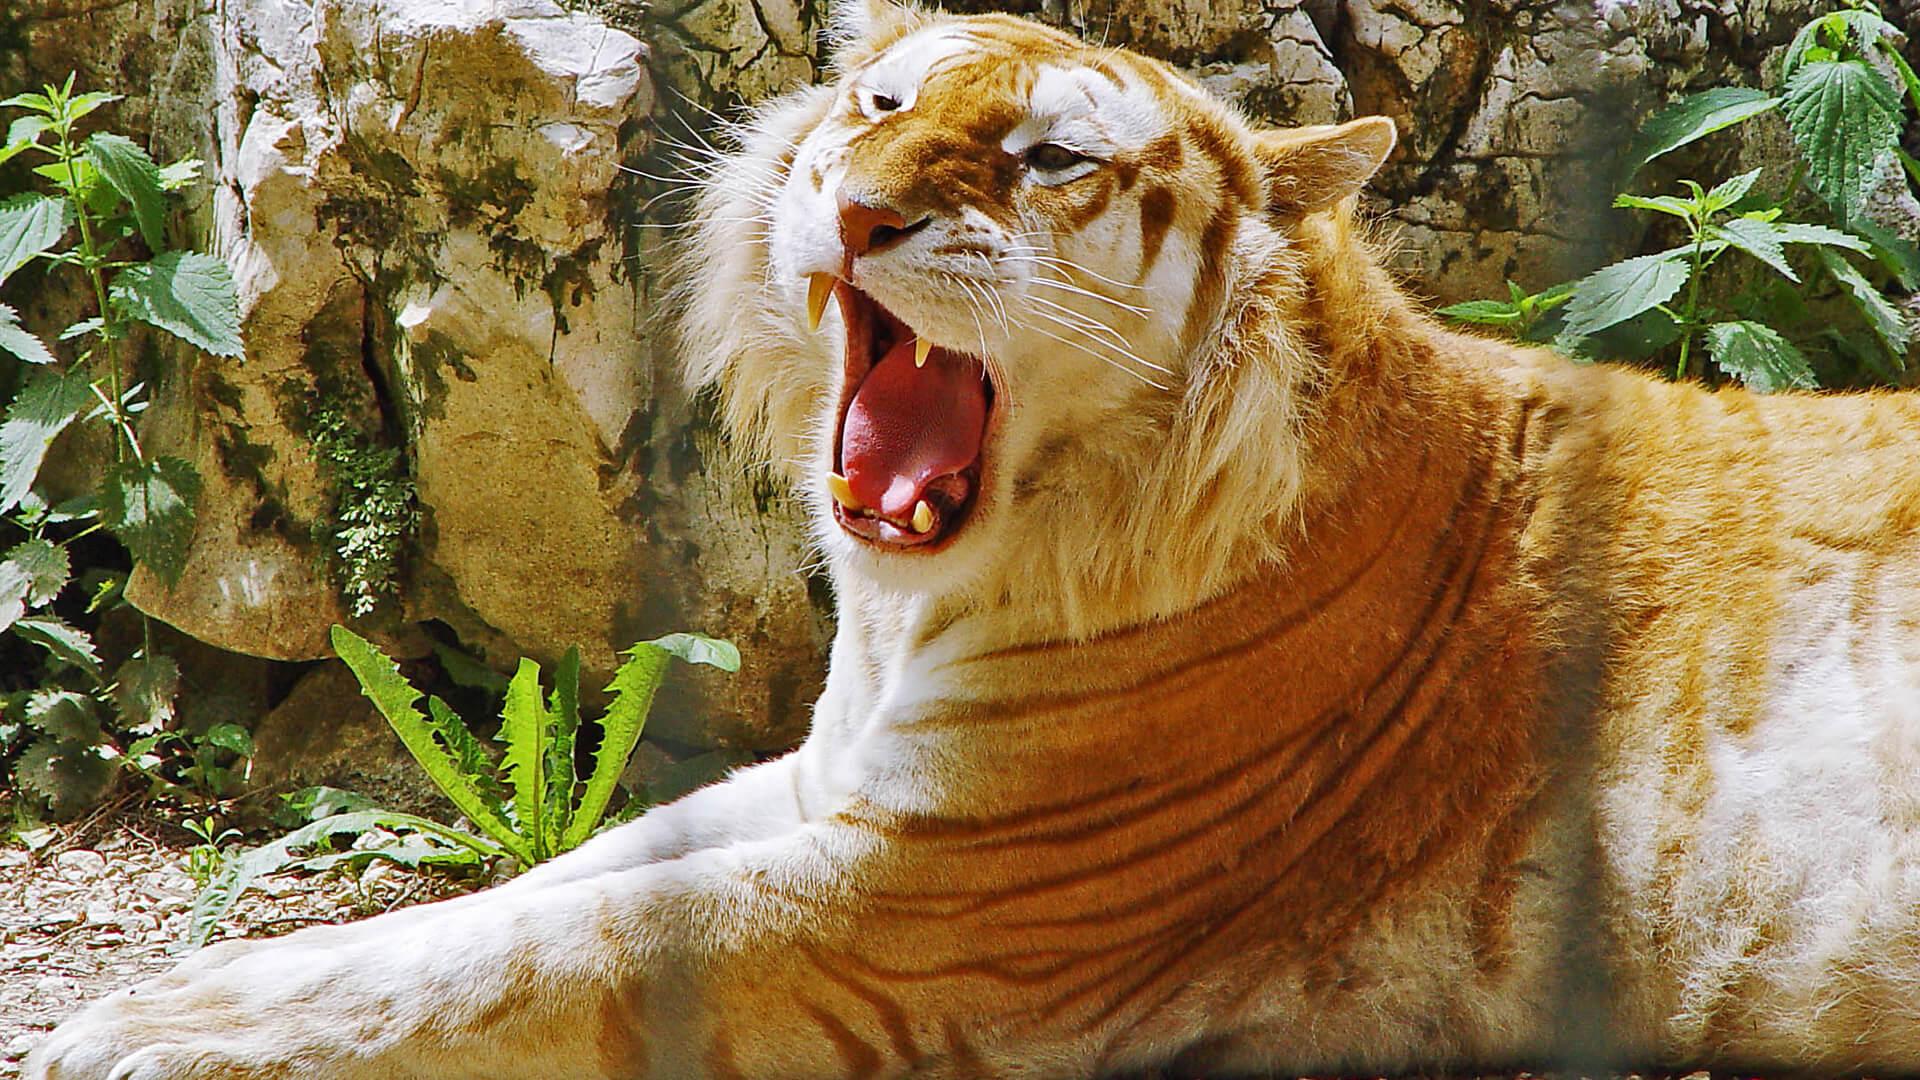 hight resolution of ii golden tigers